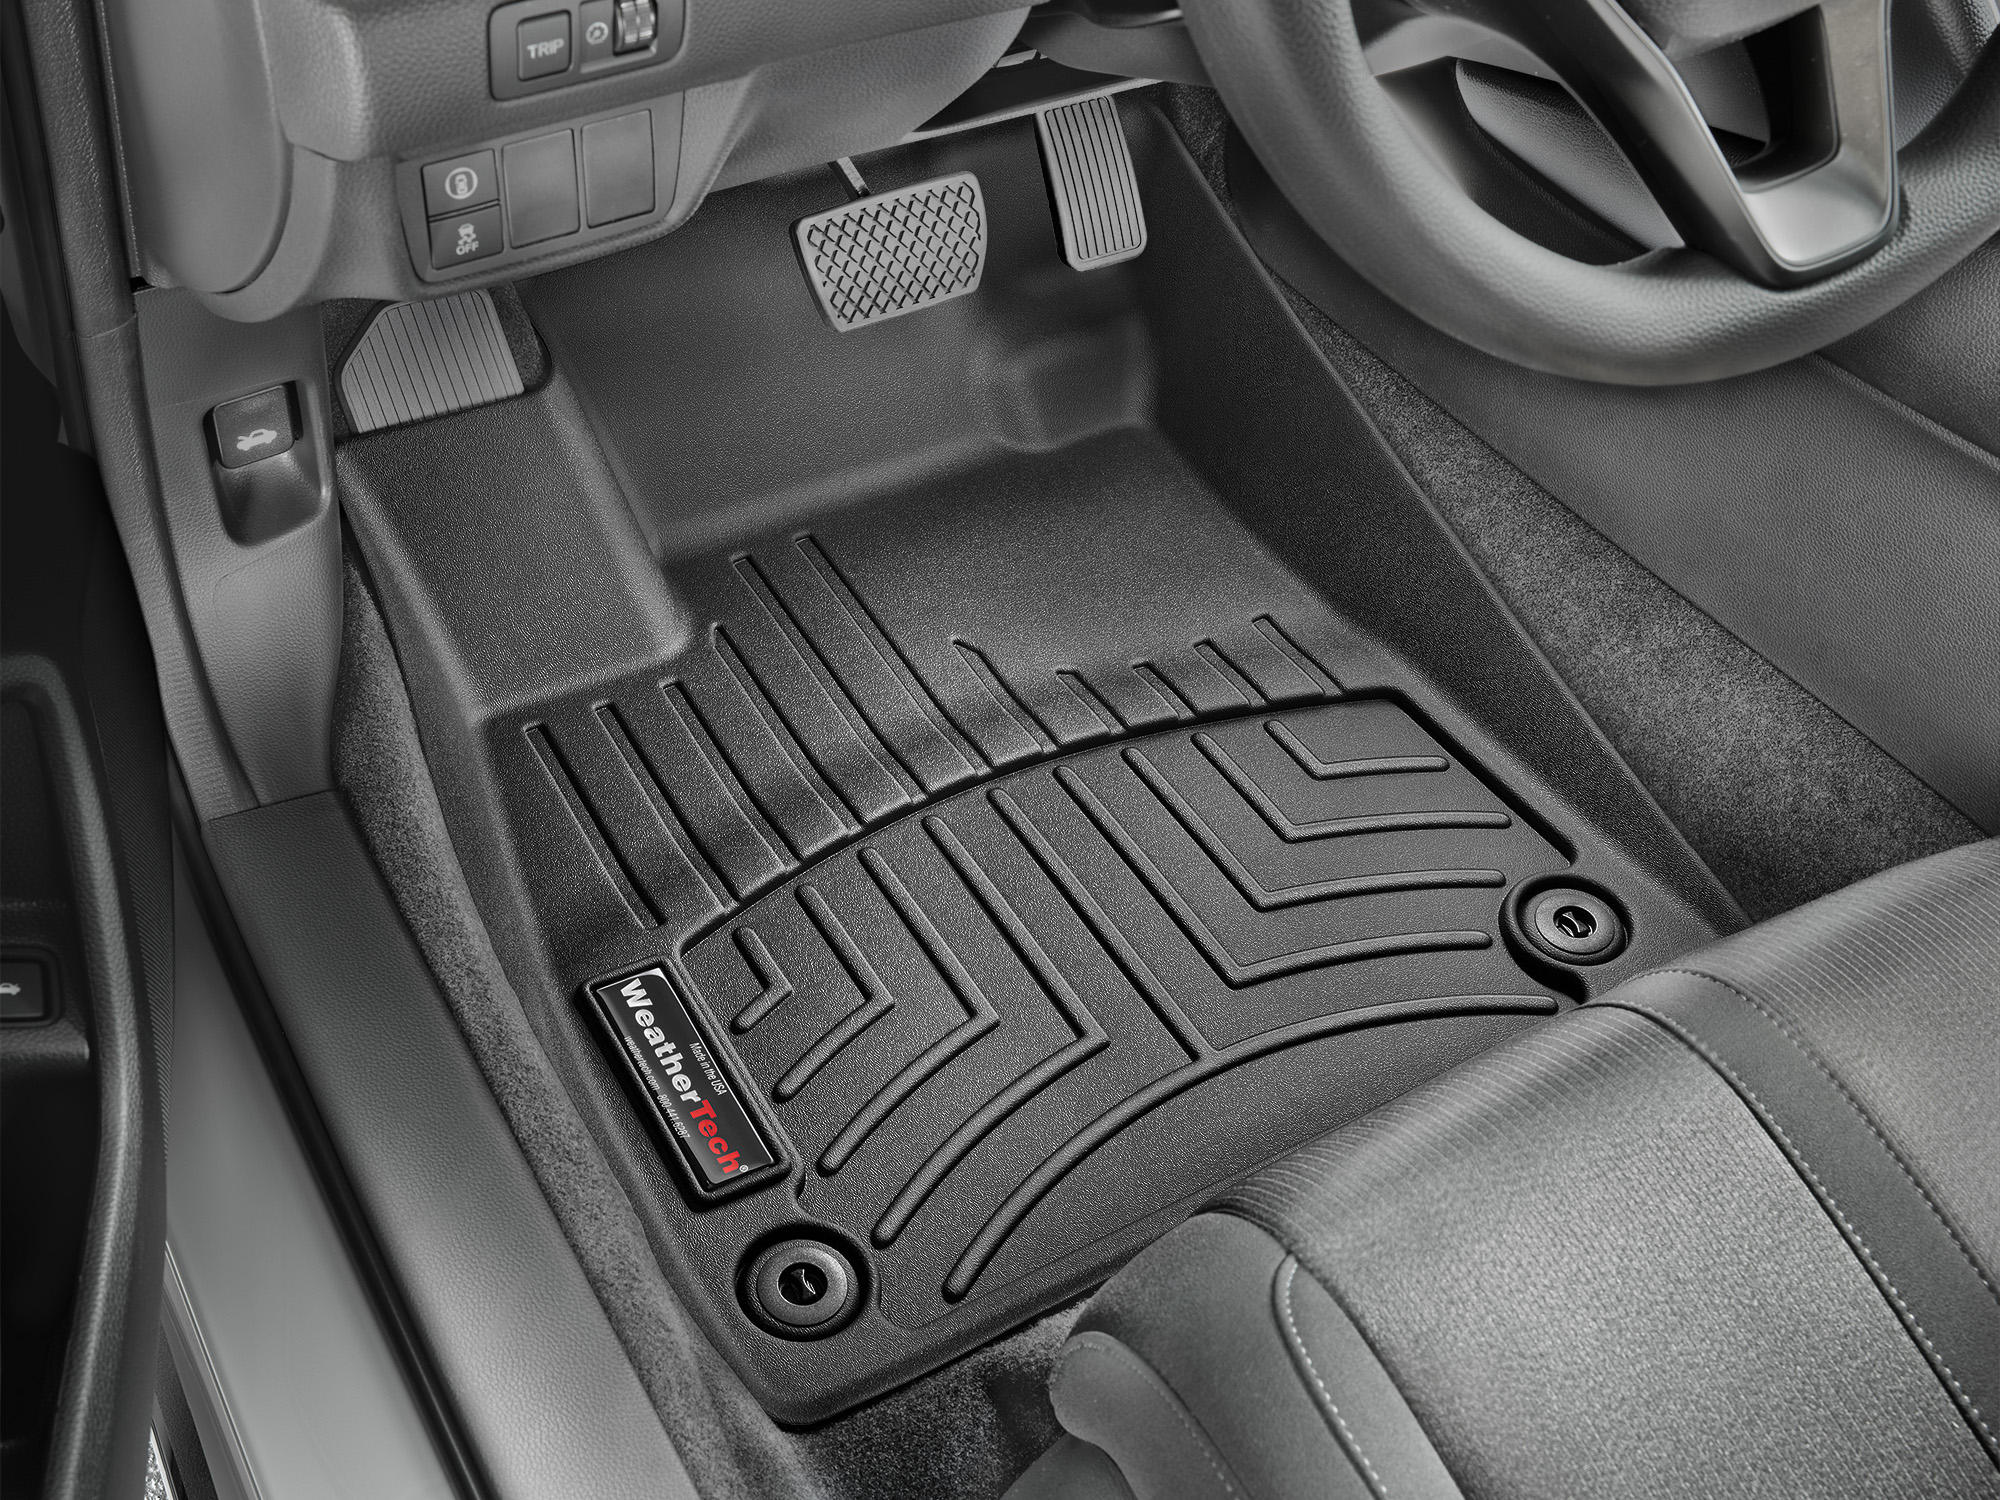 Perfect 2018 Honda Accord | AVM HD Floor Mats   Heavy Duty Flexible Trim To Fit Mats  | WeatherTech